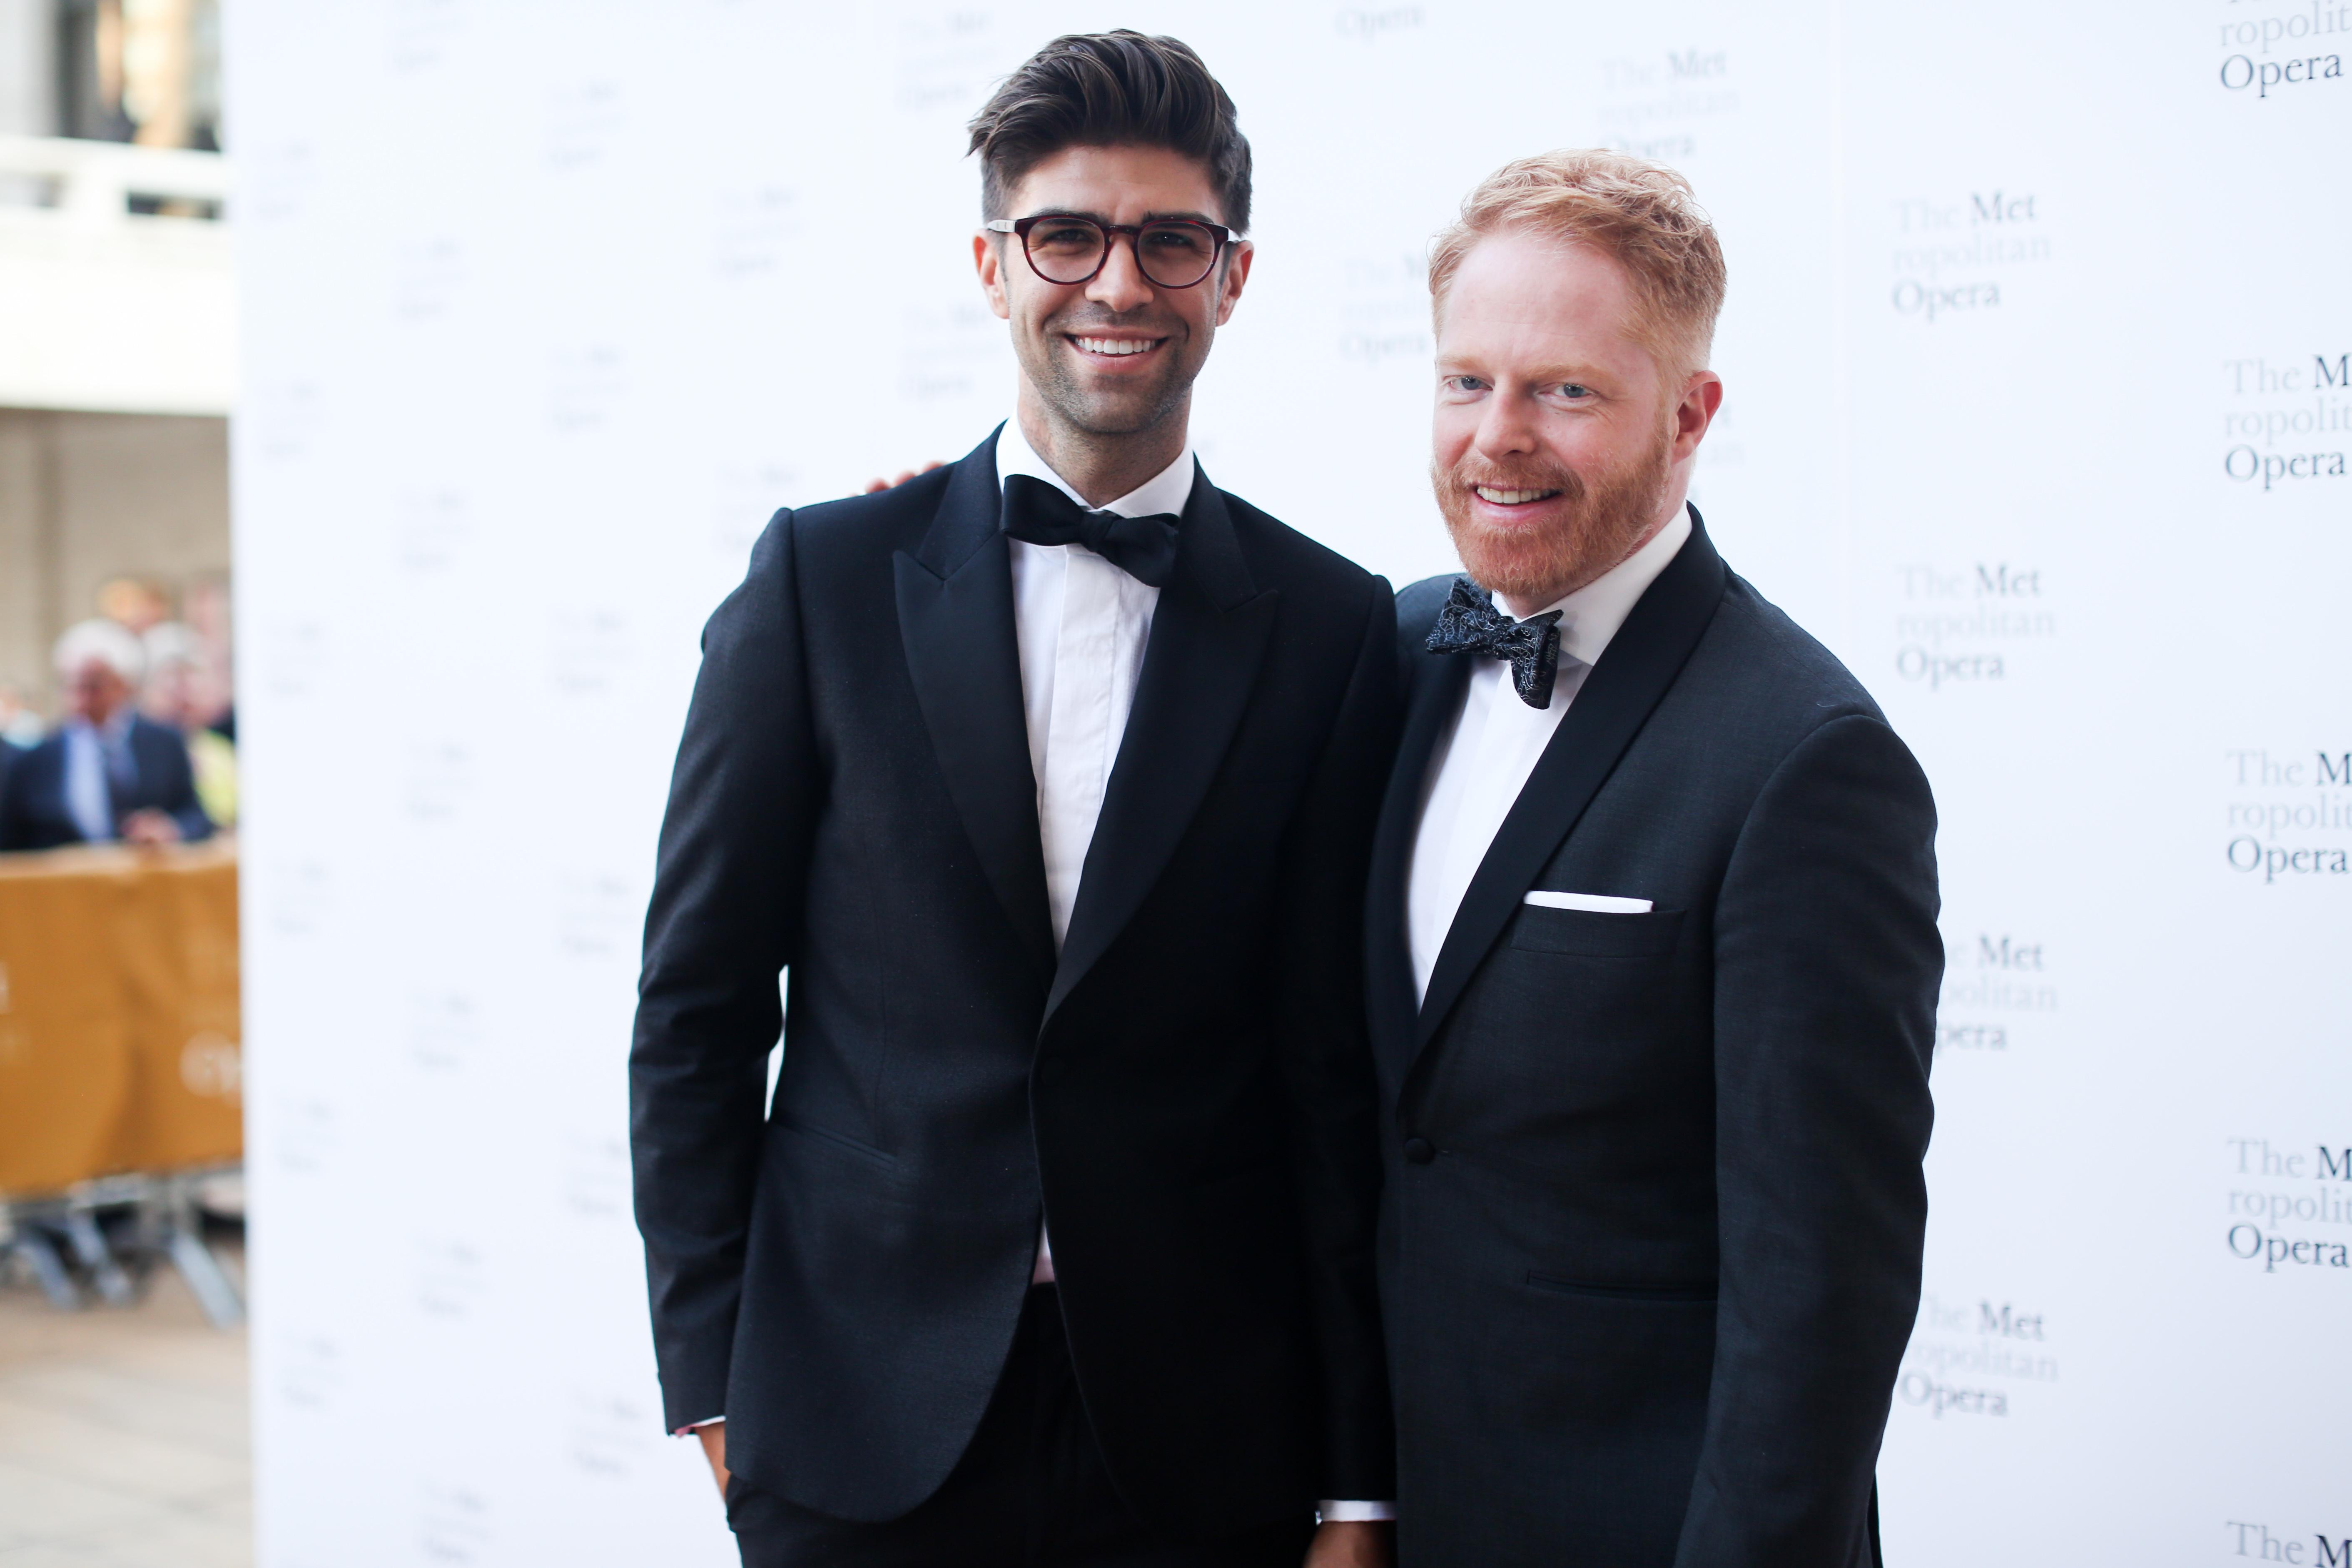 Justin Mikita and Jesse Tyler Ferguson attend the Metropolitan Opera Opening Night Gala in New York City on Sept. 25, 2017.